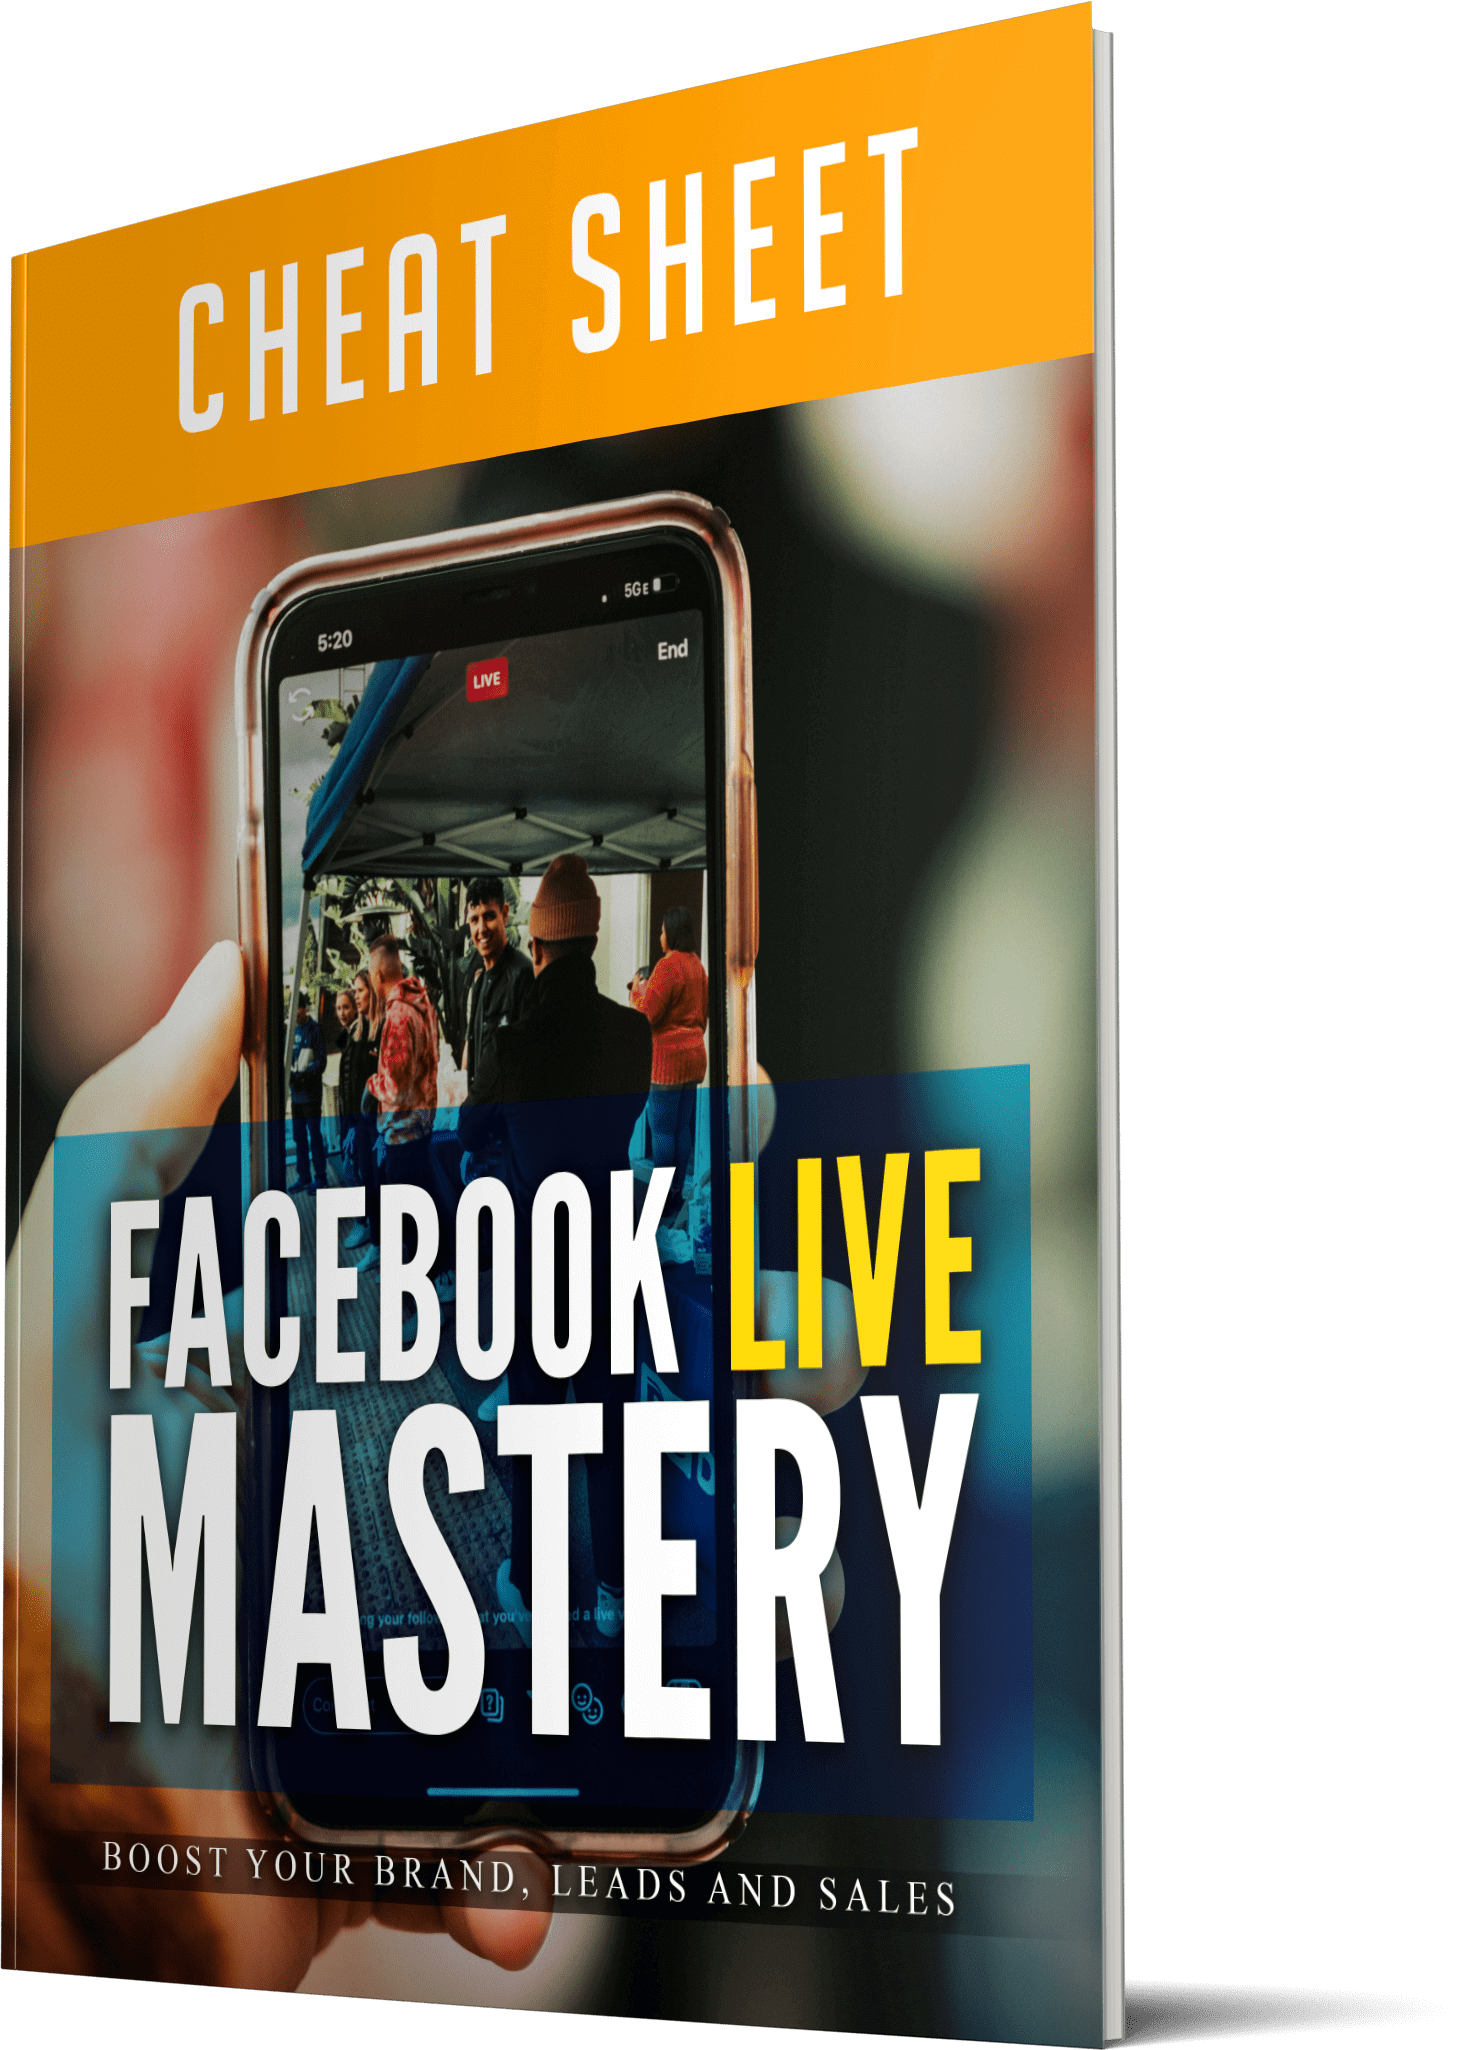 Facebook-Live-Mastery-PLR-feature-4